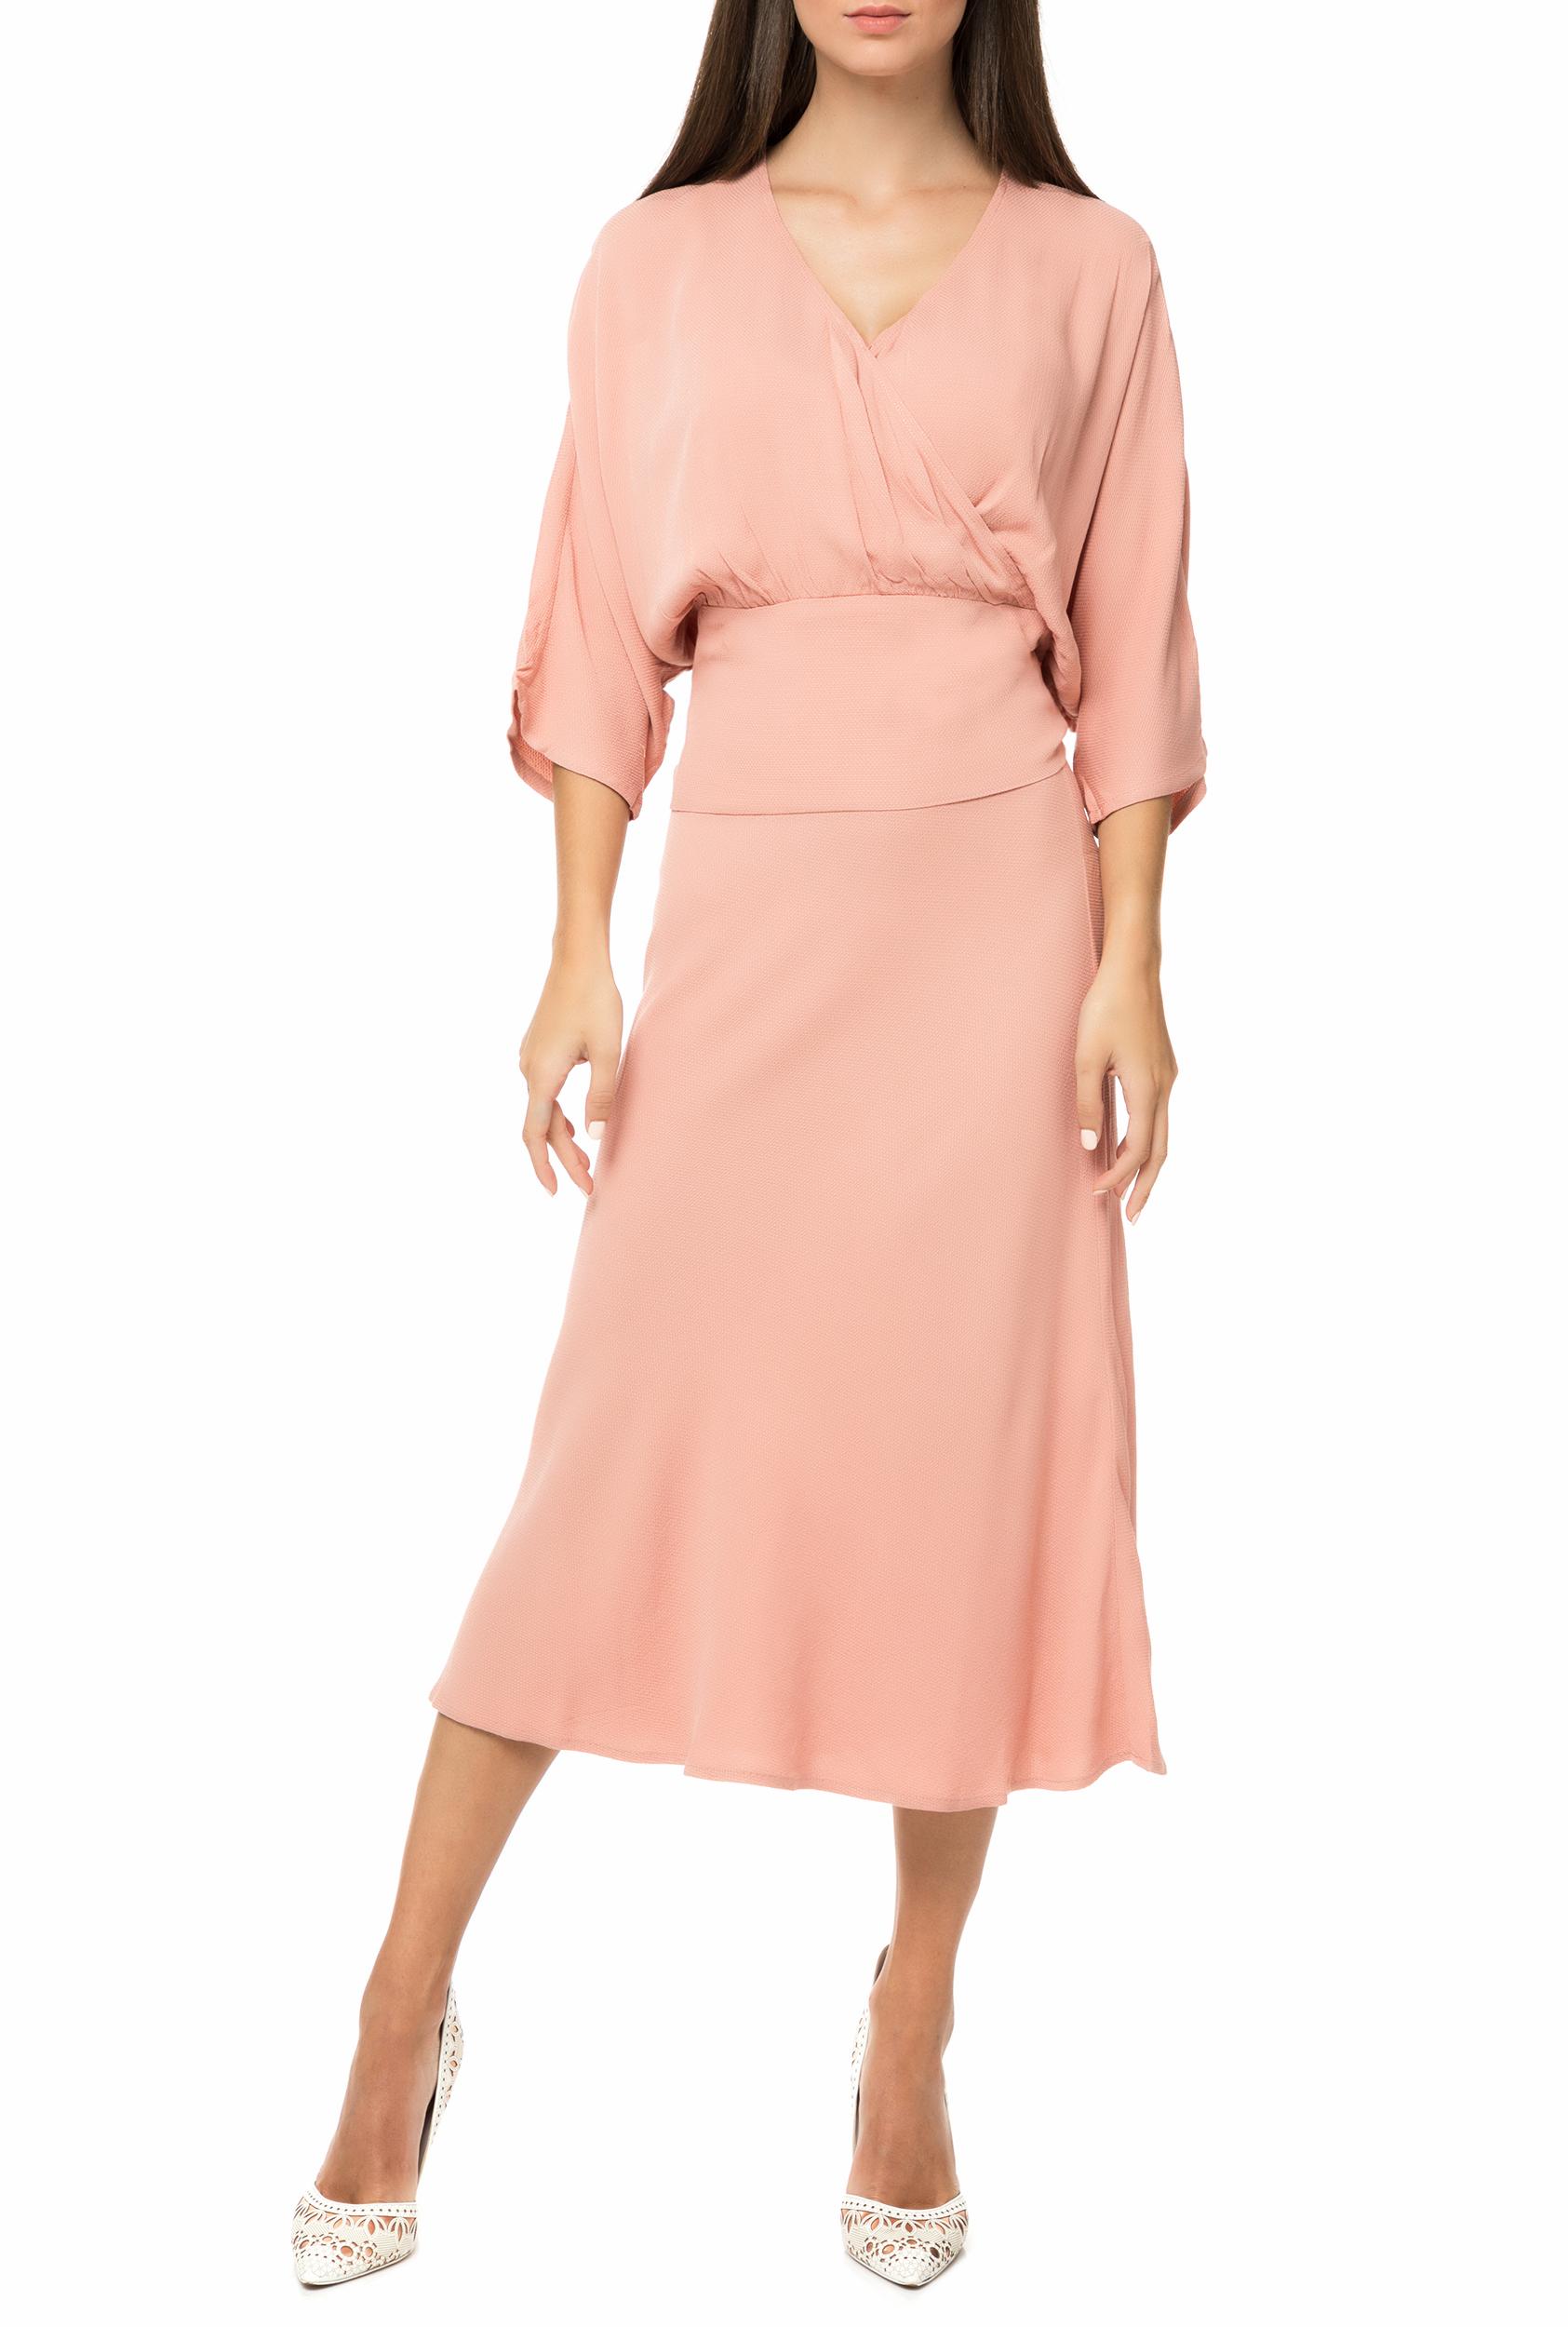 NUMPH - Γυναικείο μίντι φόρεμα NUMPH ροζ γυναικεία ρούχα φορέματα μέχρι το γόνατο